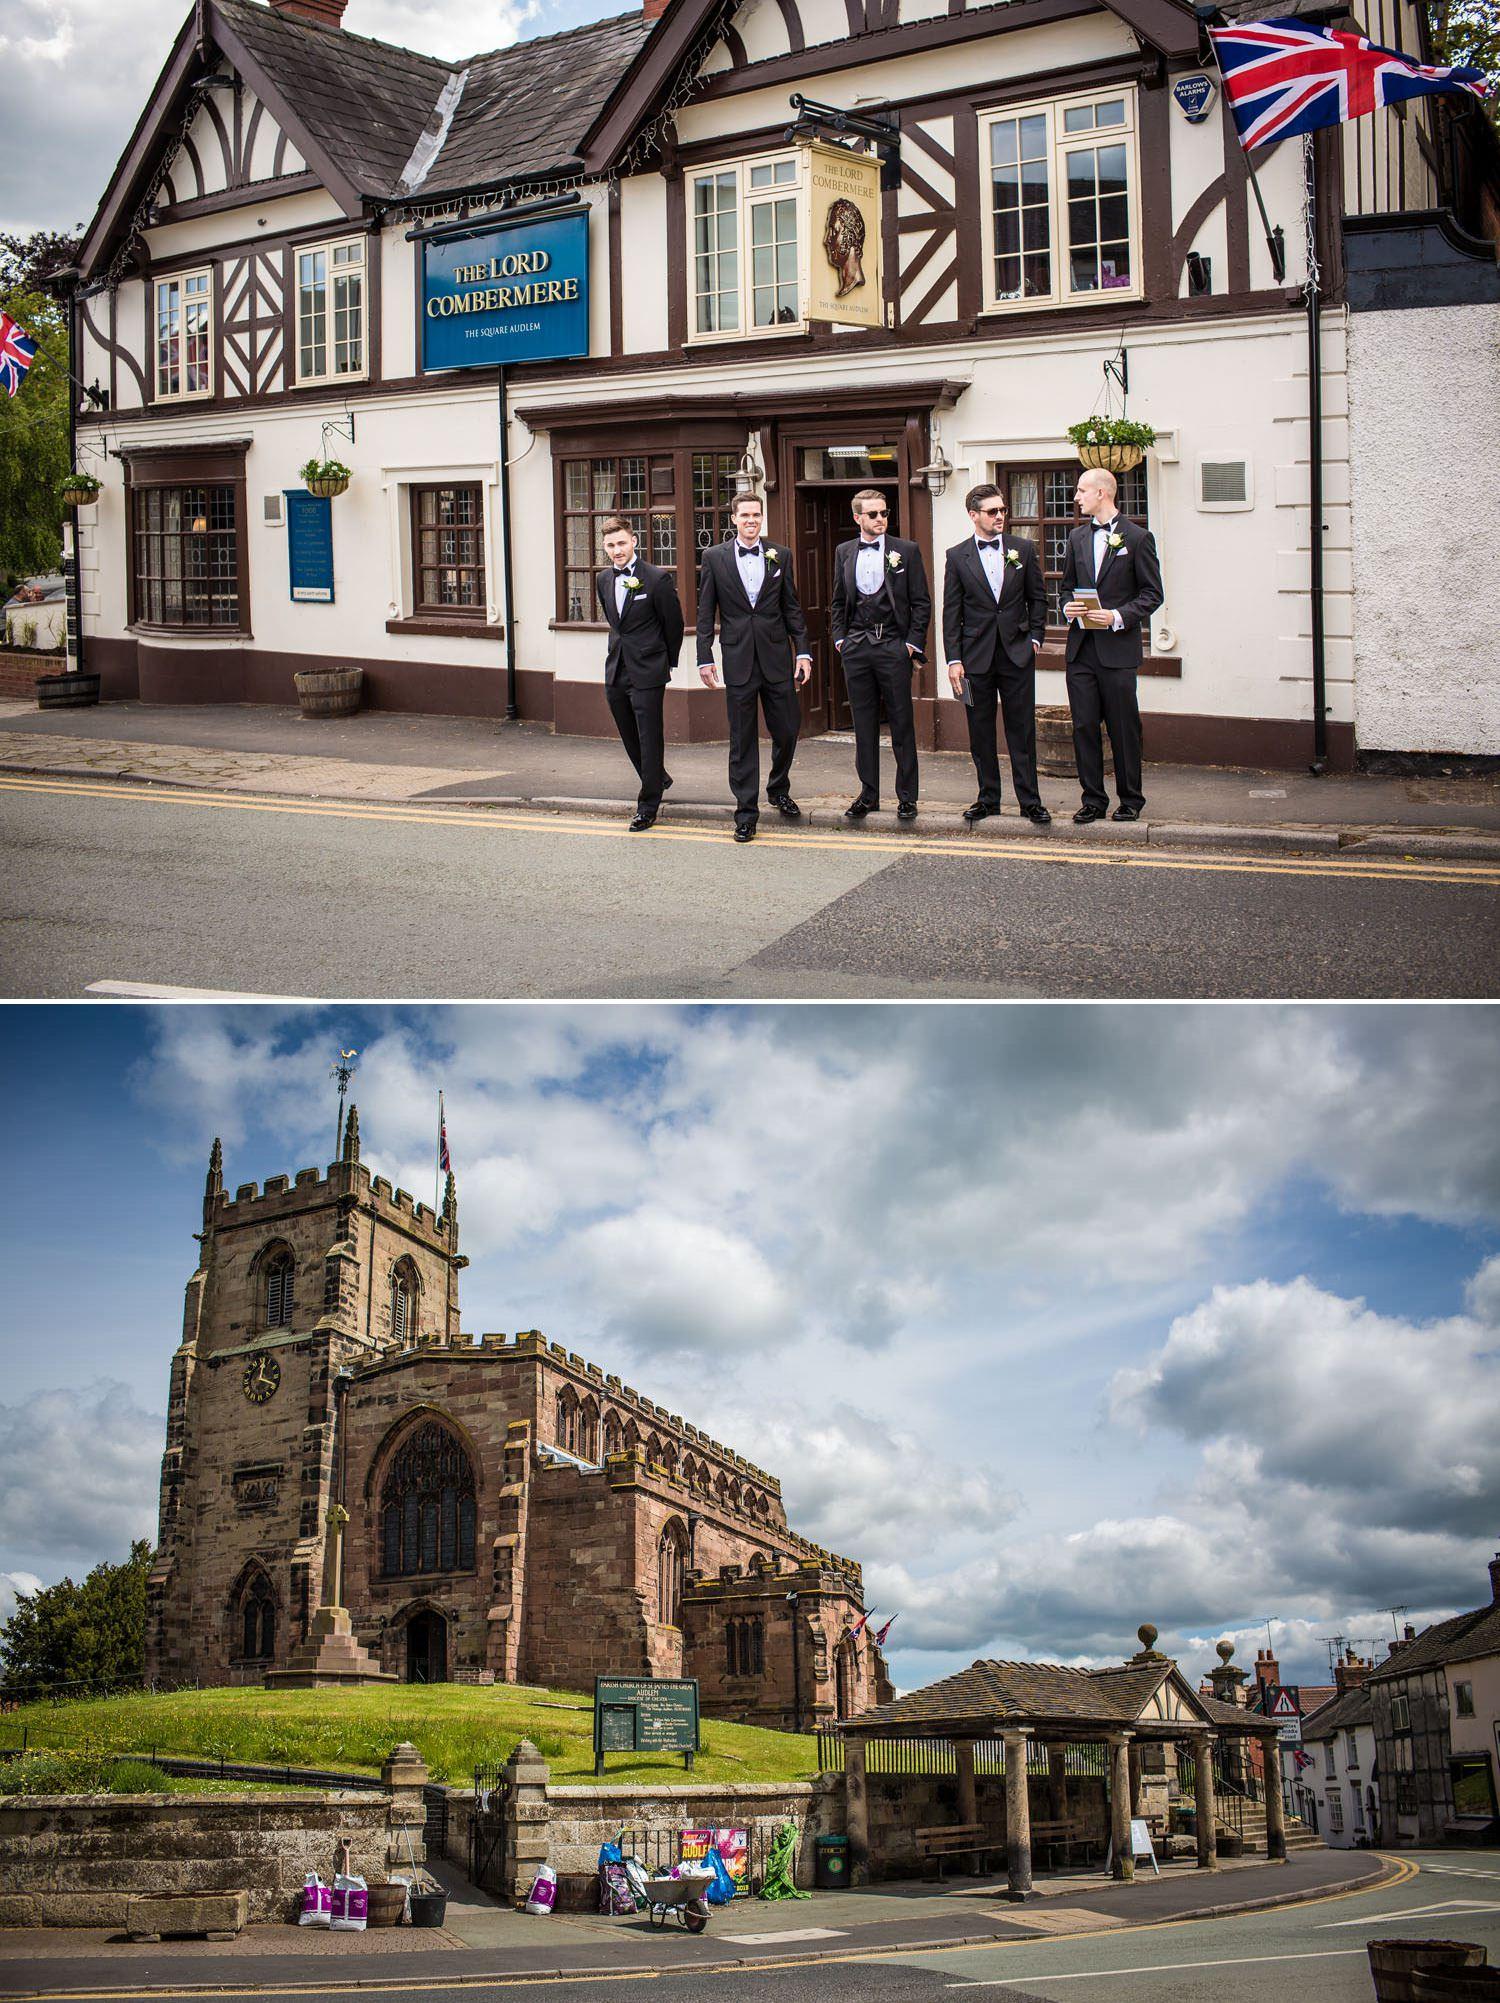 Wedding Photography Tern Hill Hall, Shropshire groom arriving at church